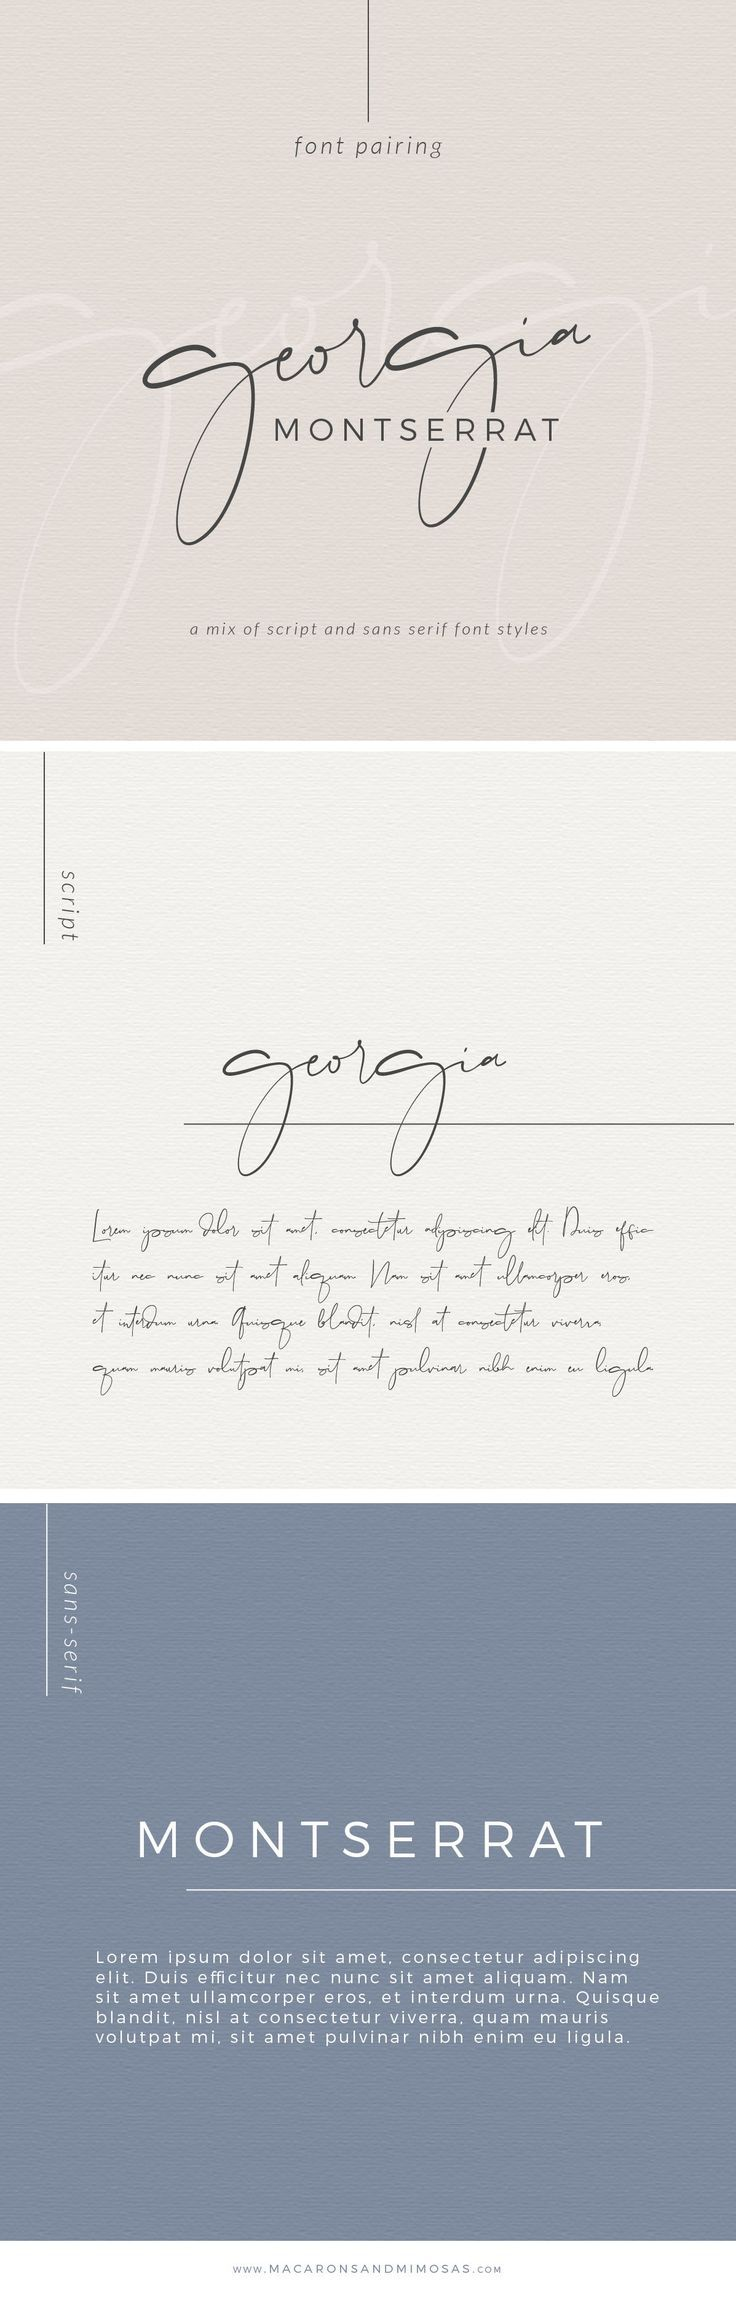 Font Pairing • April